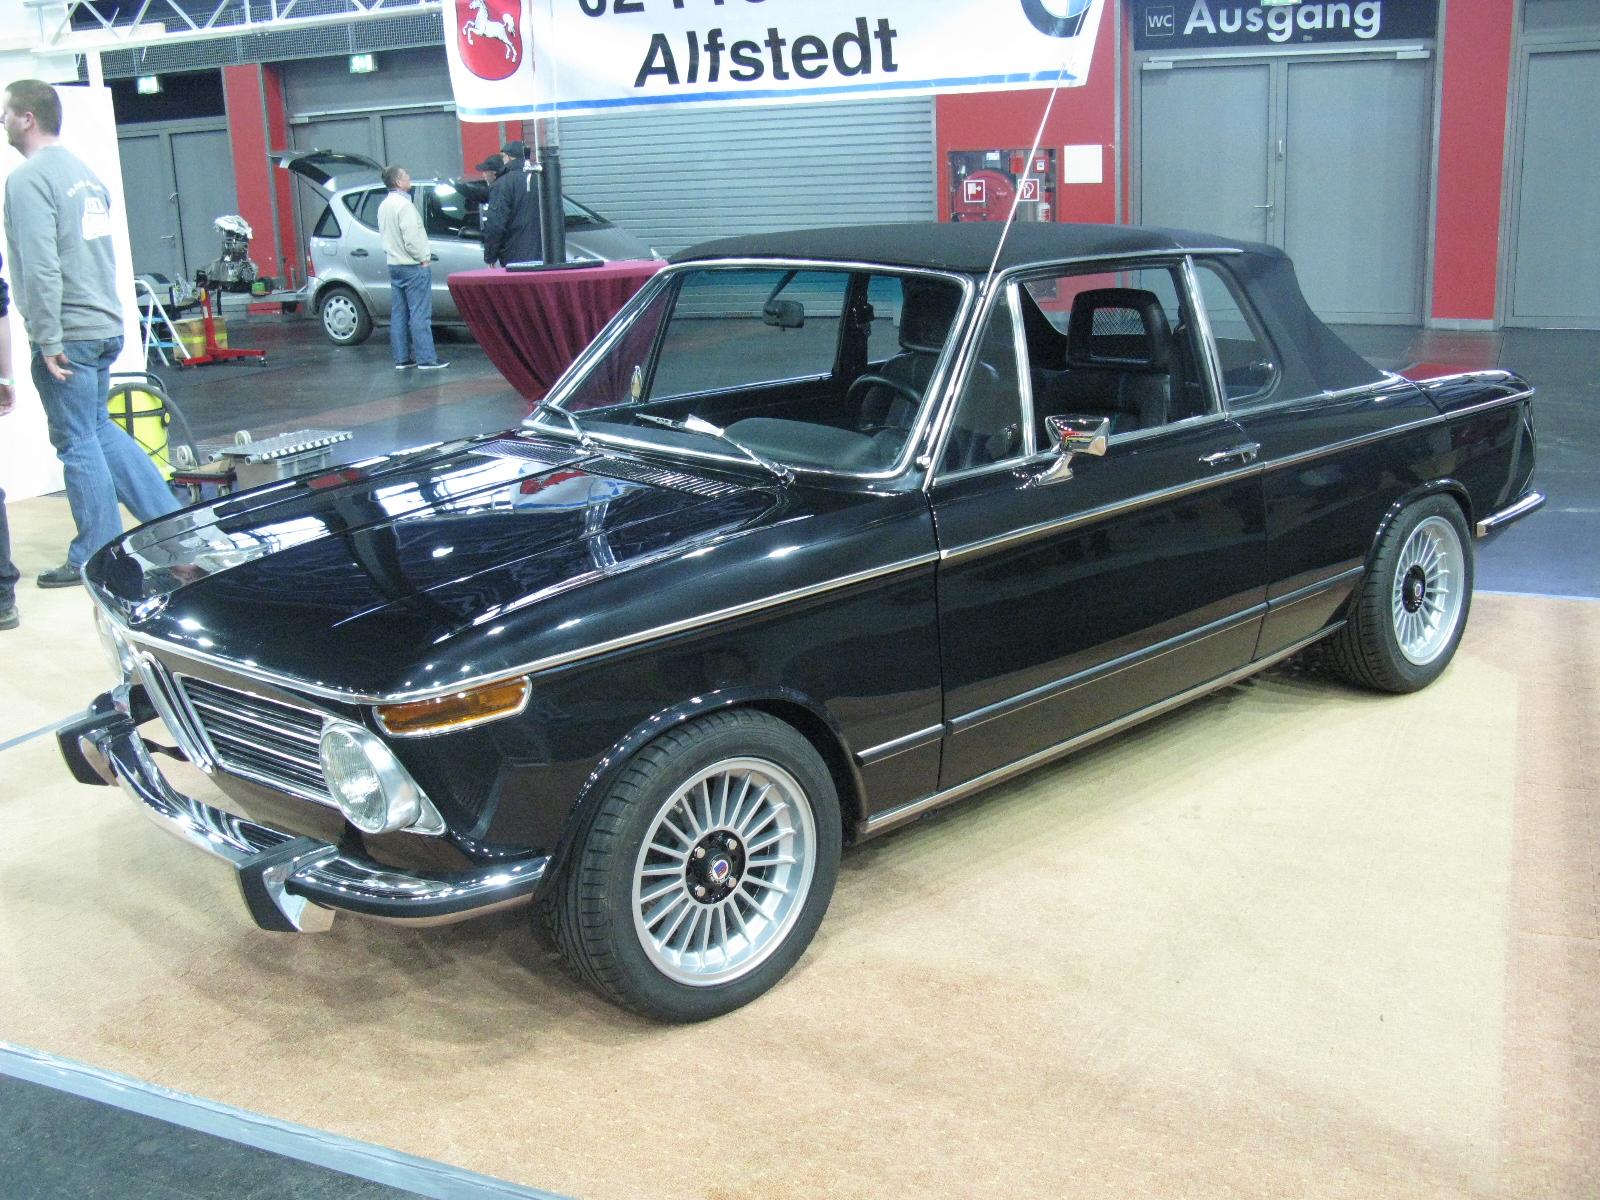 Bmw 2002 Sale >> File:BMW 2002 Tii Alpina A4 Baur Cabriolet (8494005274).jpg - Wikimedia Commons